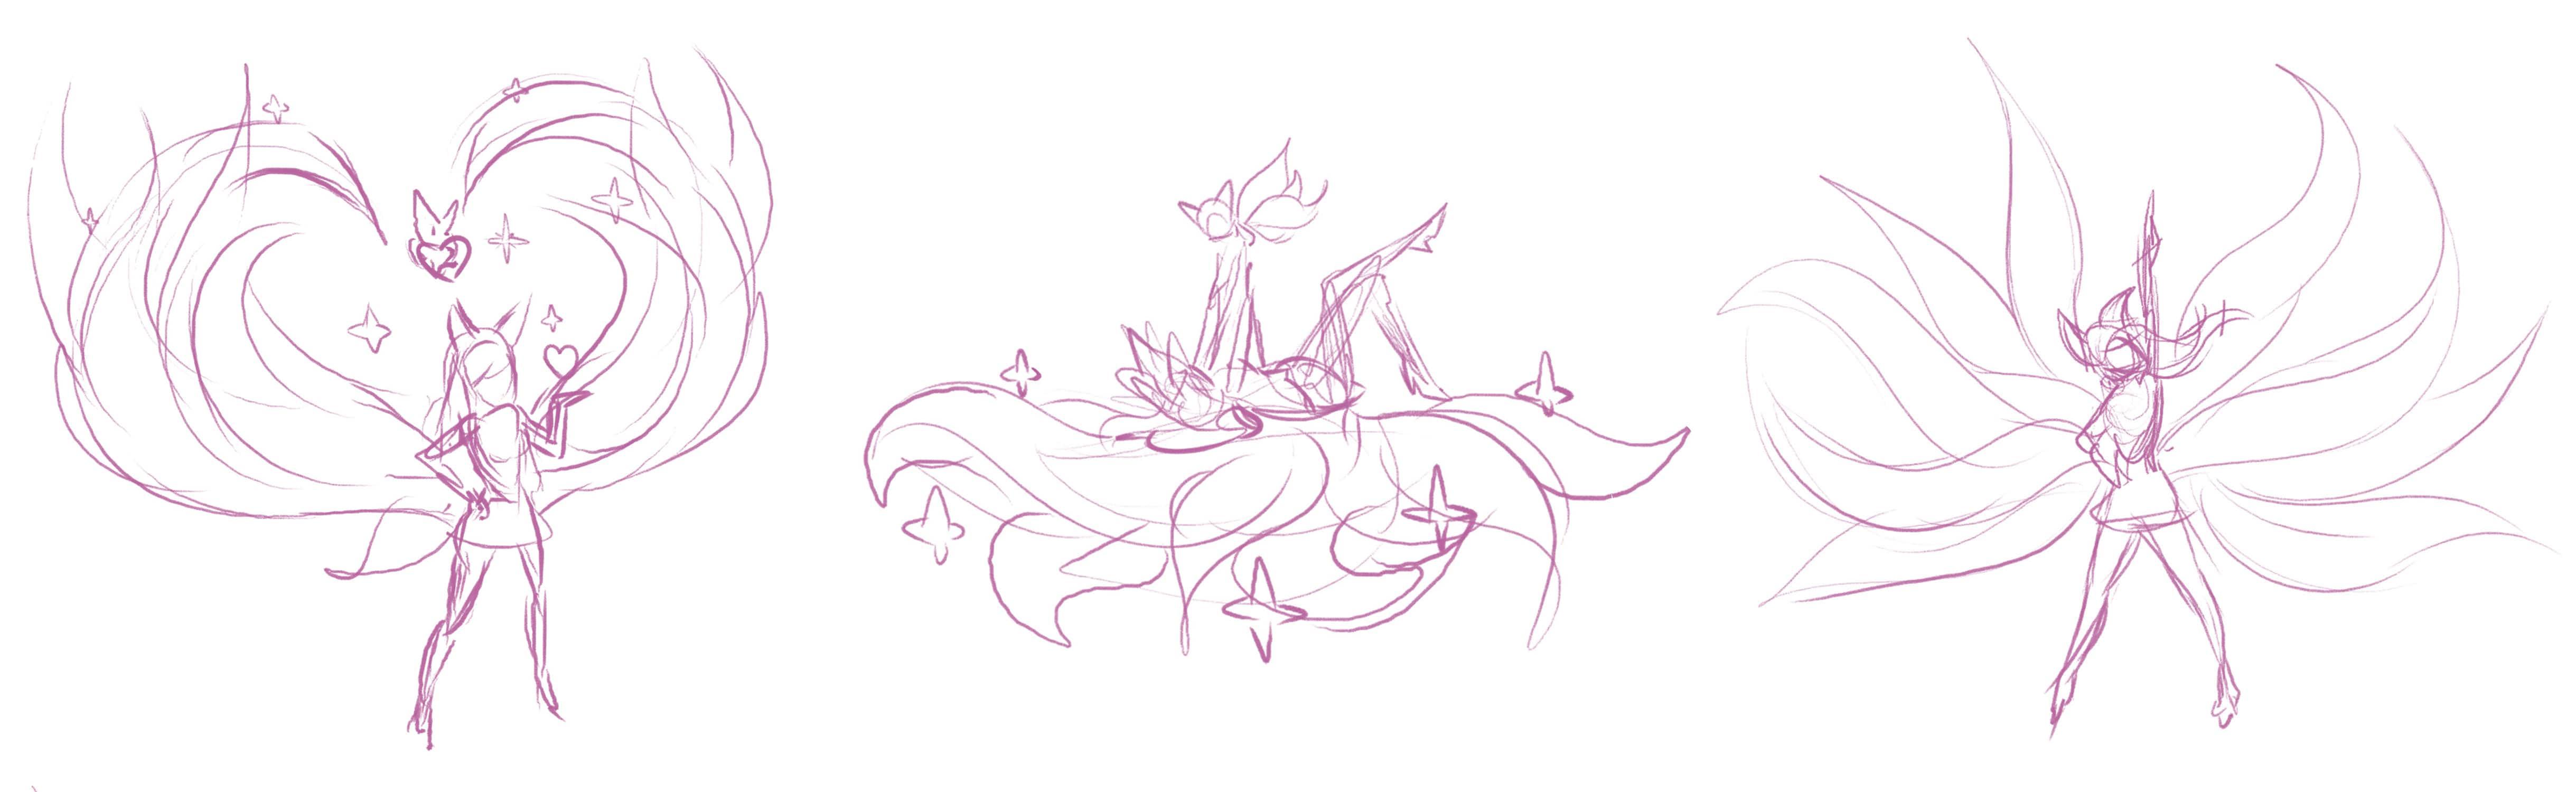 Ahri's Tails, Animation Study